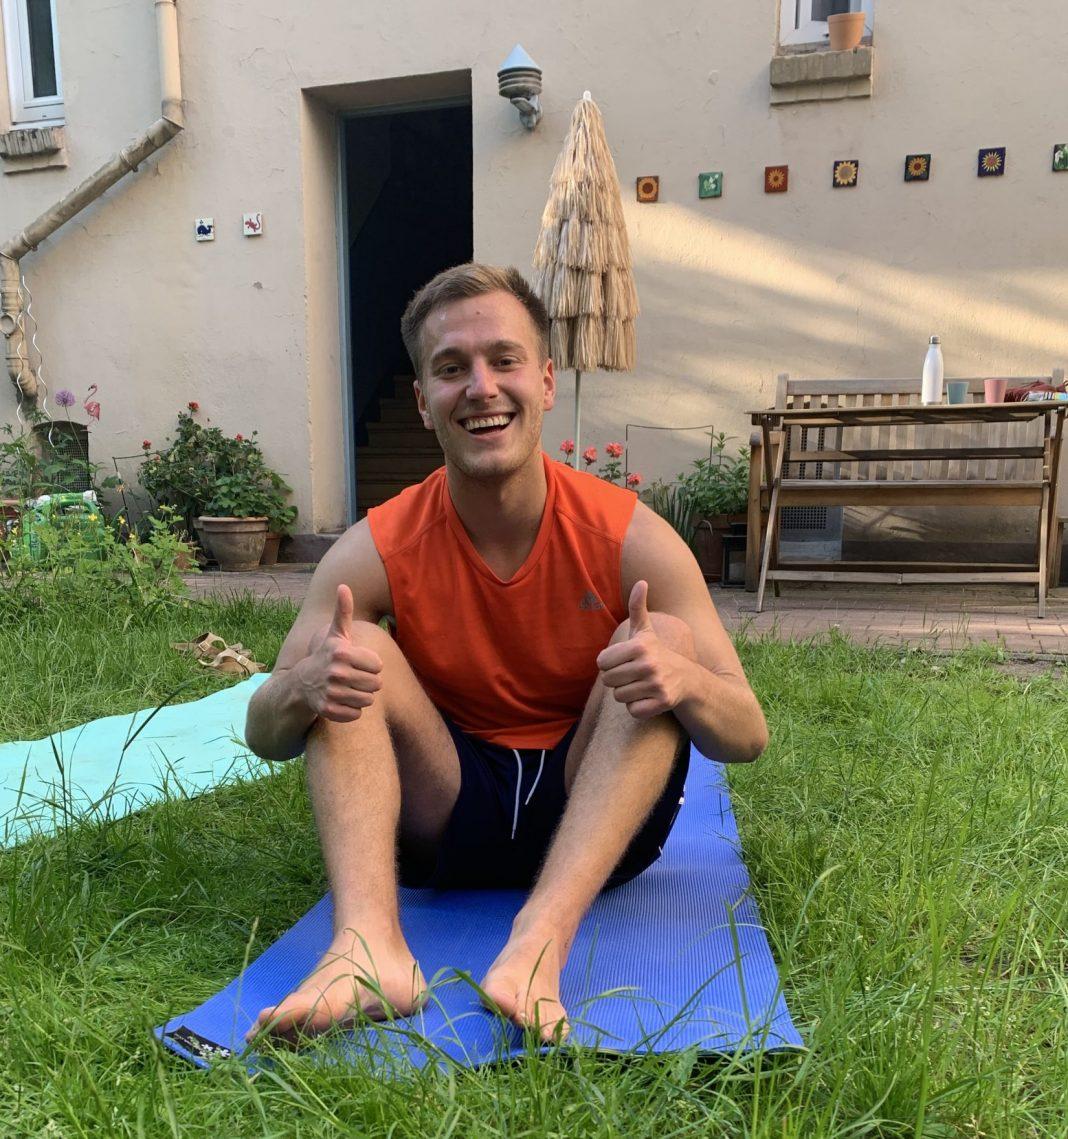 Workout mit Pamela Reif statt Fitnessstudio